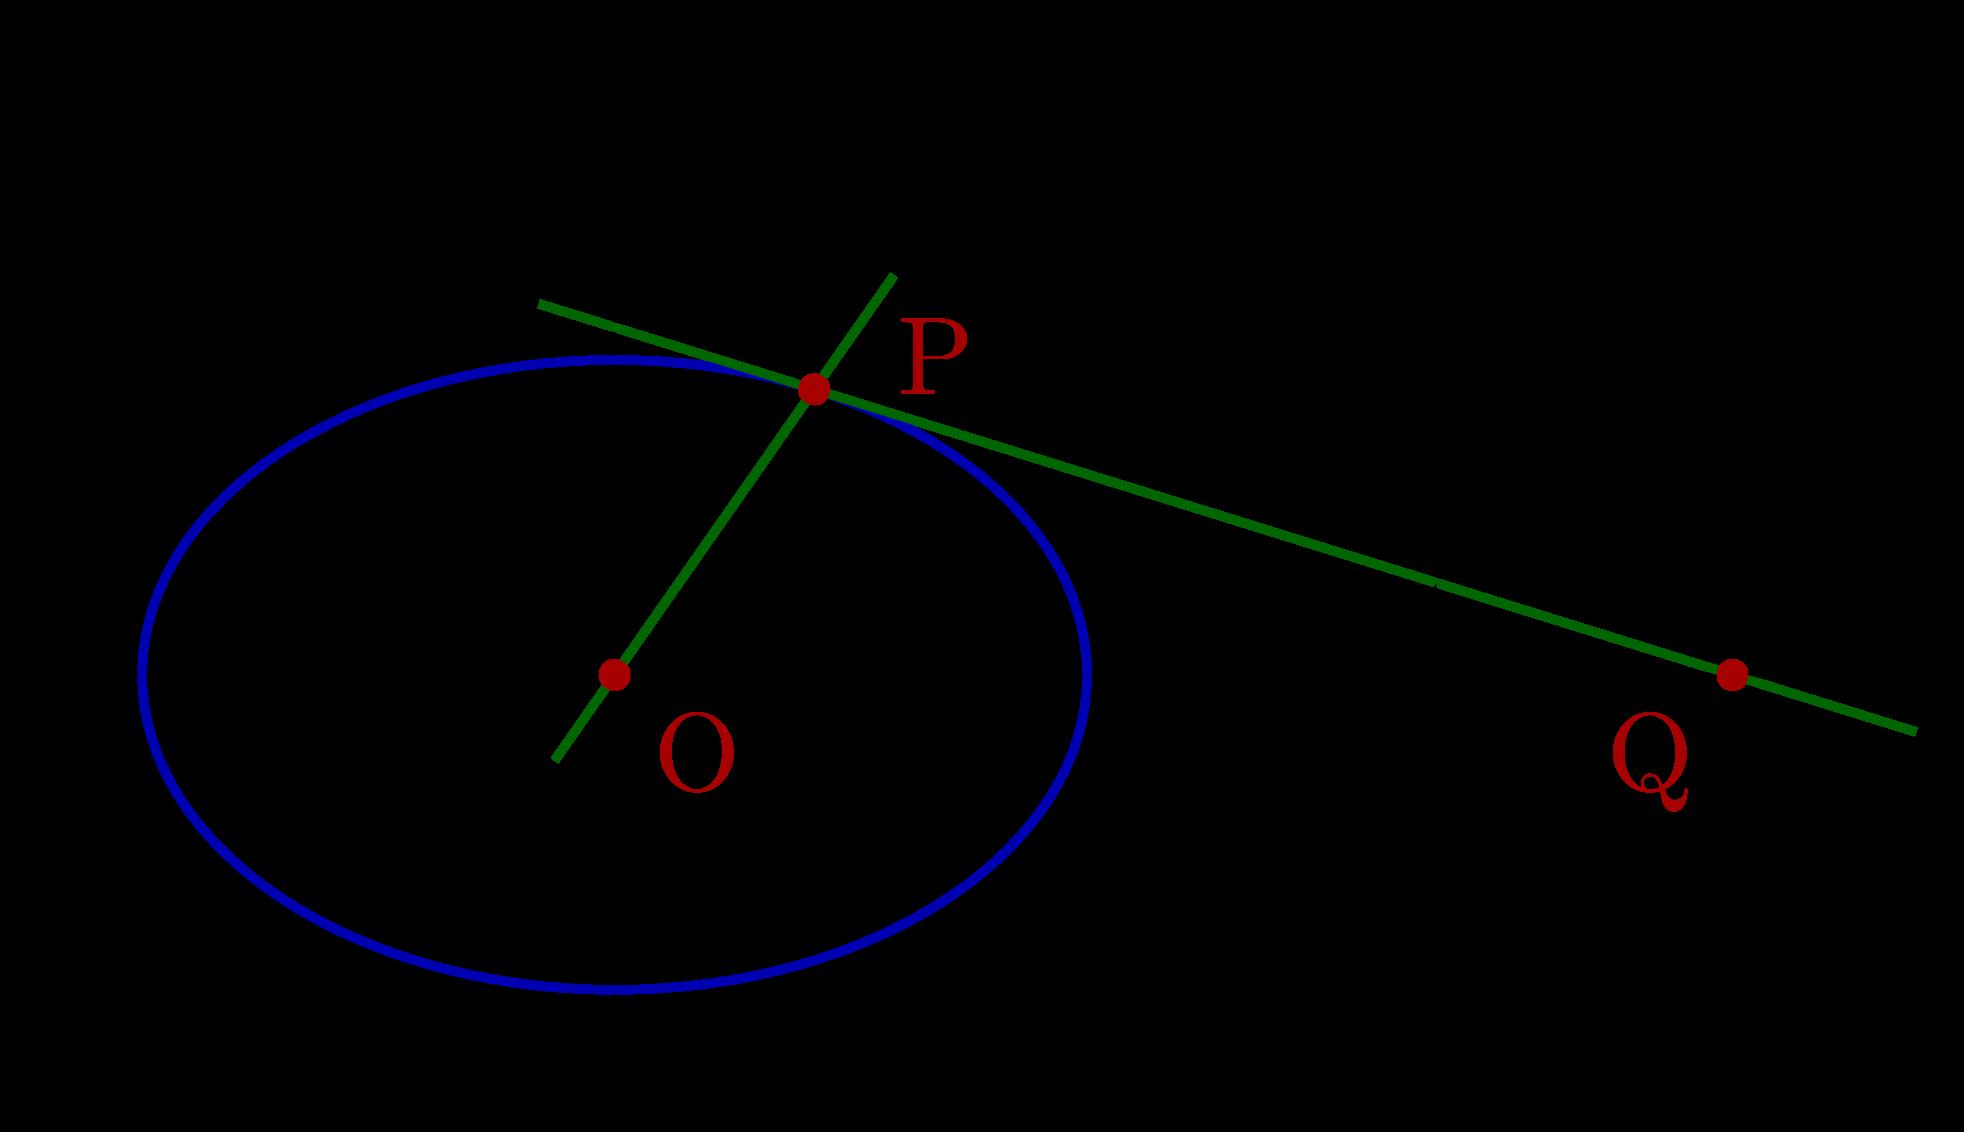 circle_tangent-004.png